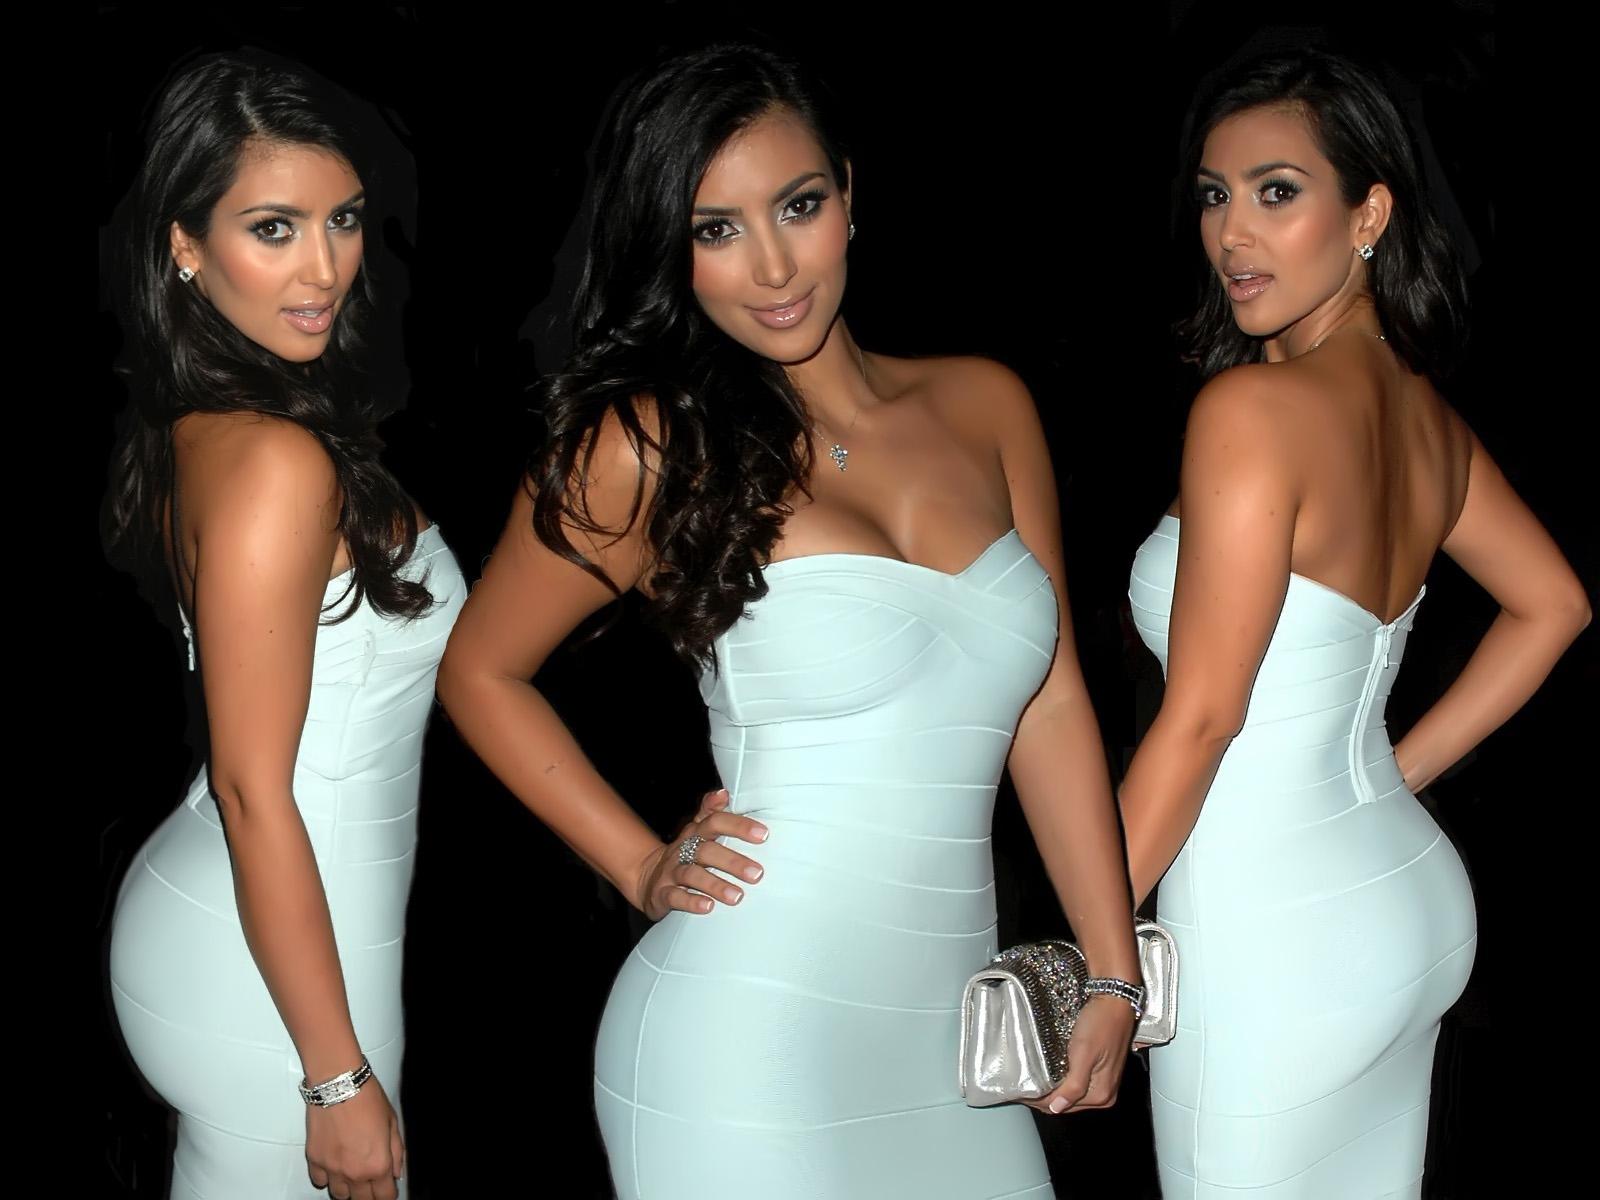 http://1.bp.blogspot.com/-3LxhIQx66hE/UDUmSkWQ69I/AAAAAAAAA80/Qgah1YwVv3A/s1600/Kim-Kardashian+hot+white+dress+wallpaper+(1620+x+1200).jpg